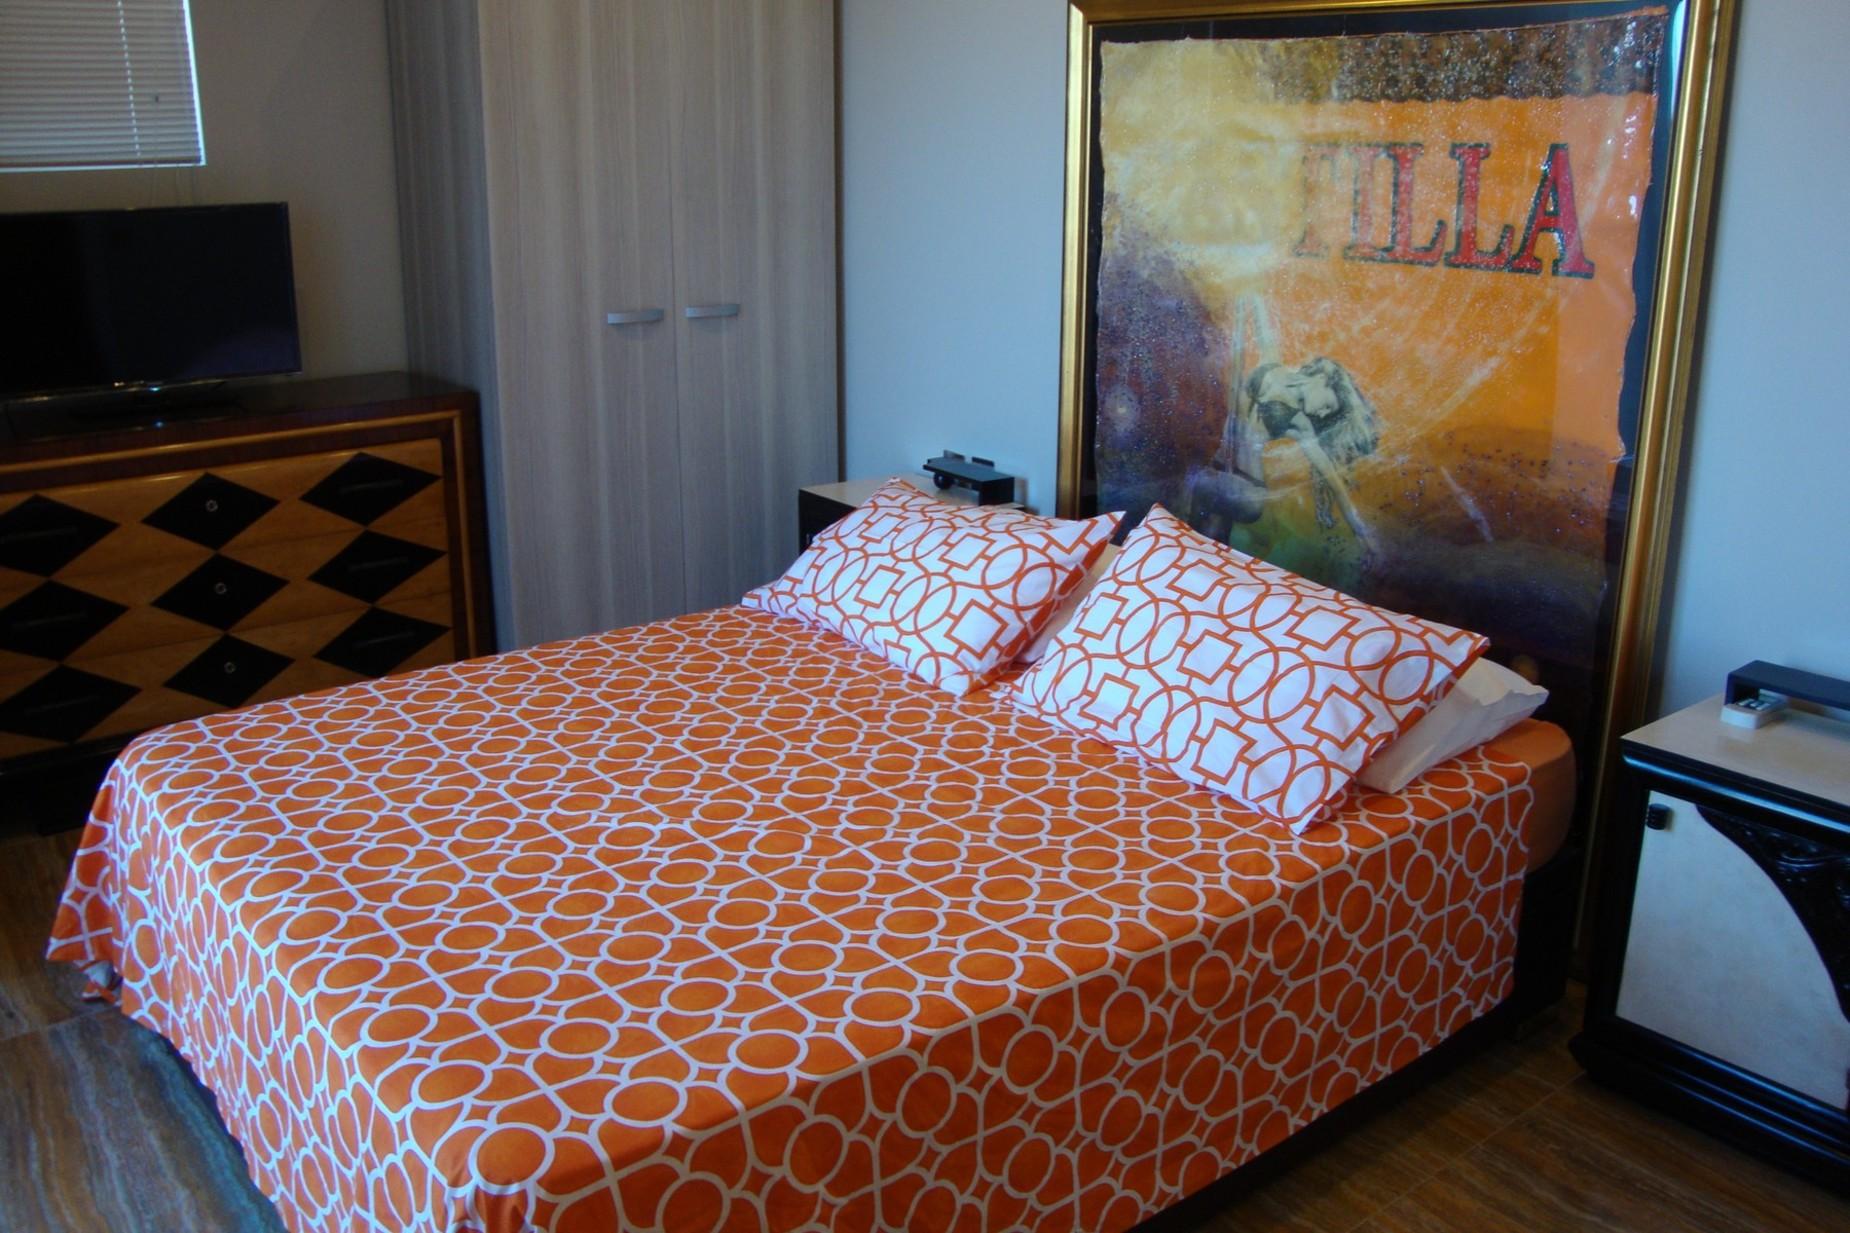 3 bed Villa For Rent in Siggiewi, Siggiewi - thumb 17